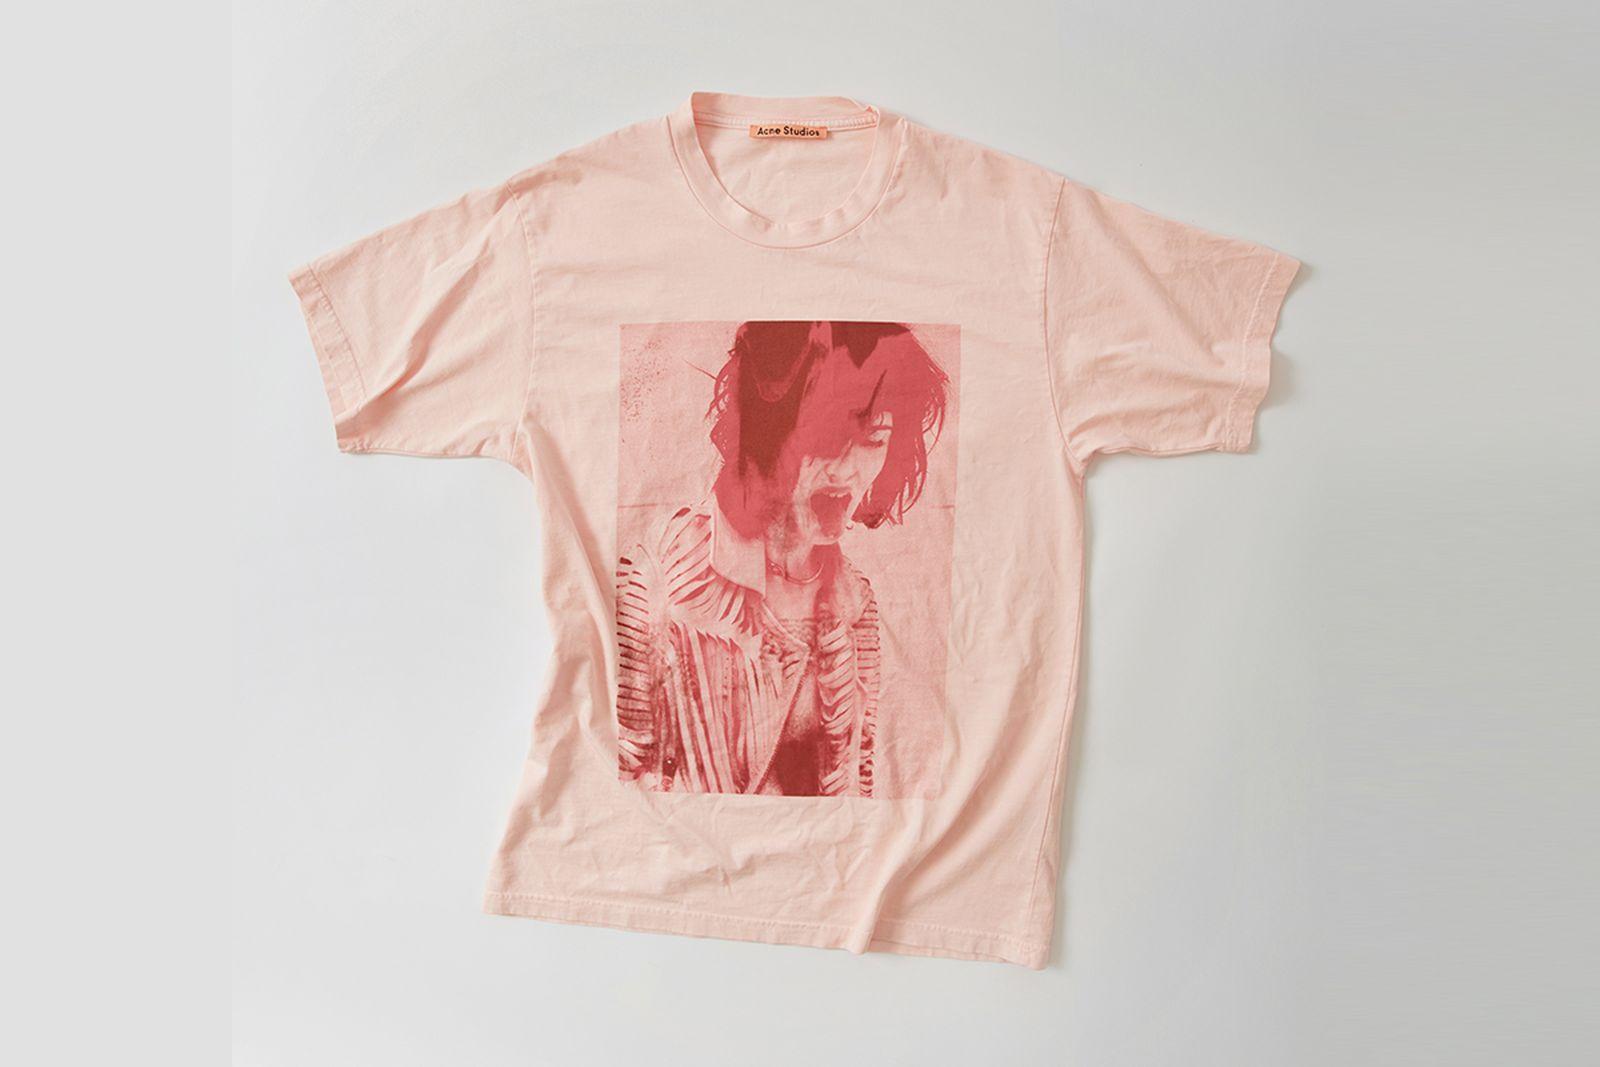 ss ux tshi000002 pale pink Acne Studios SS18